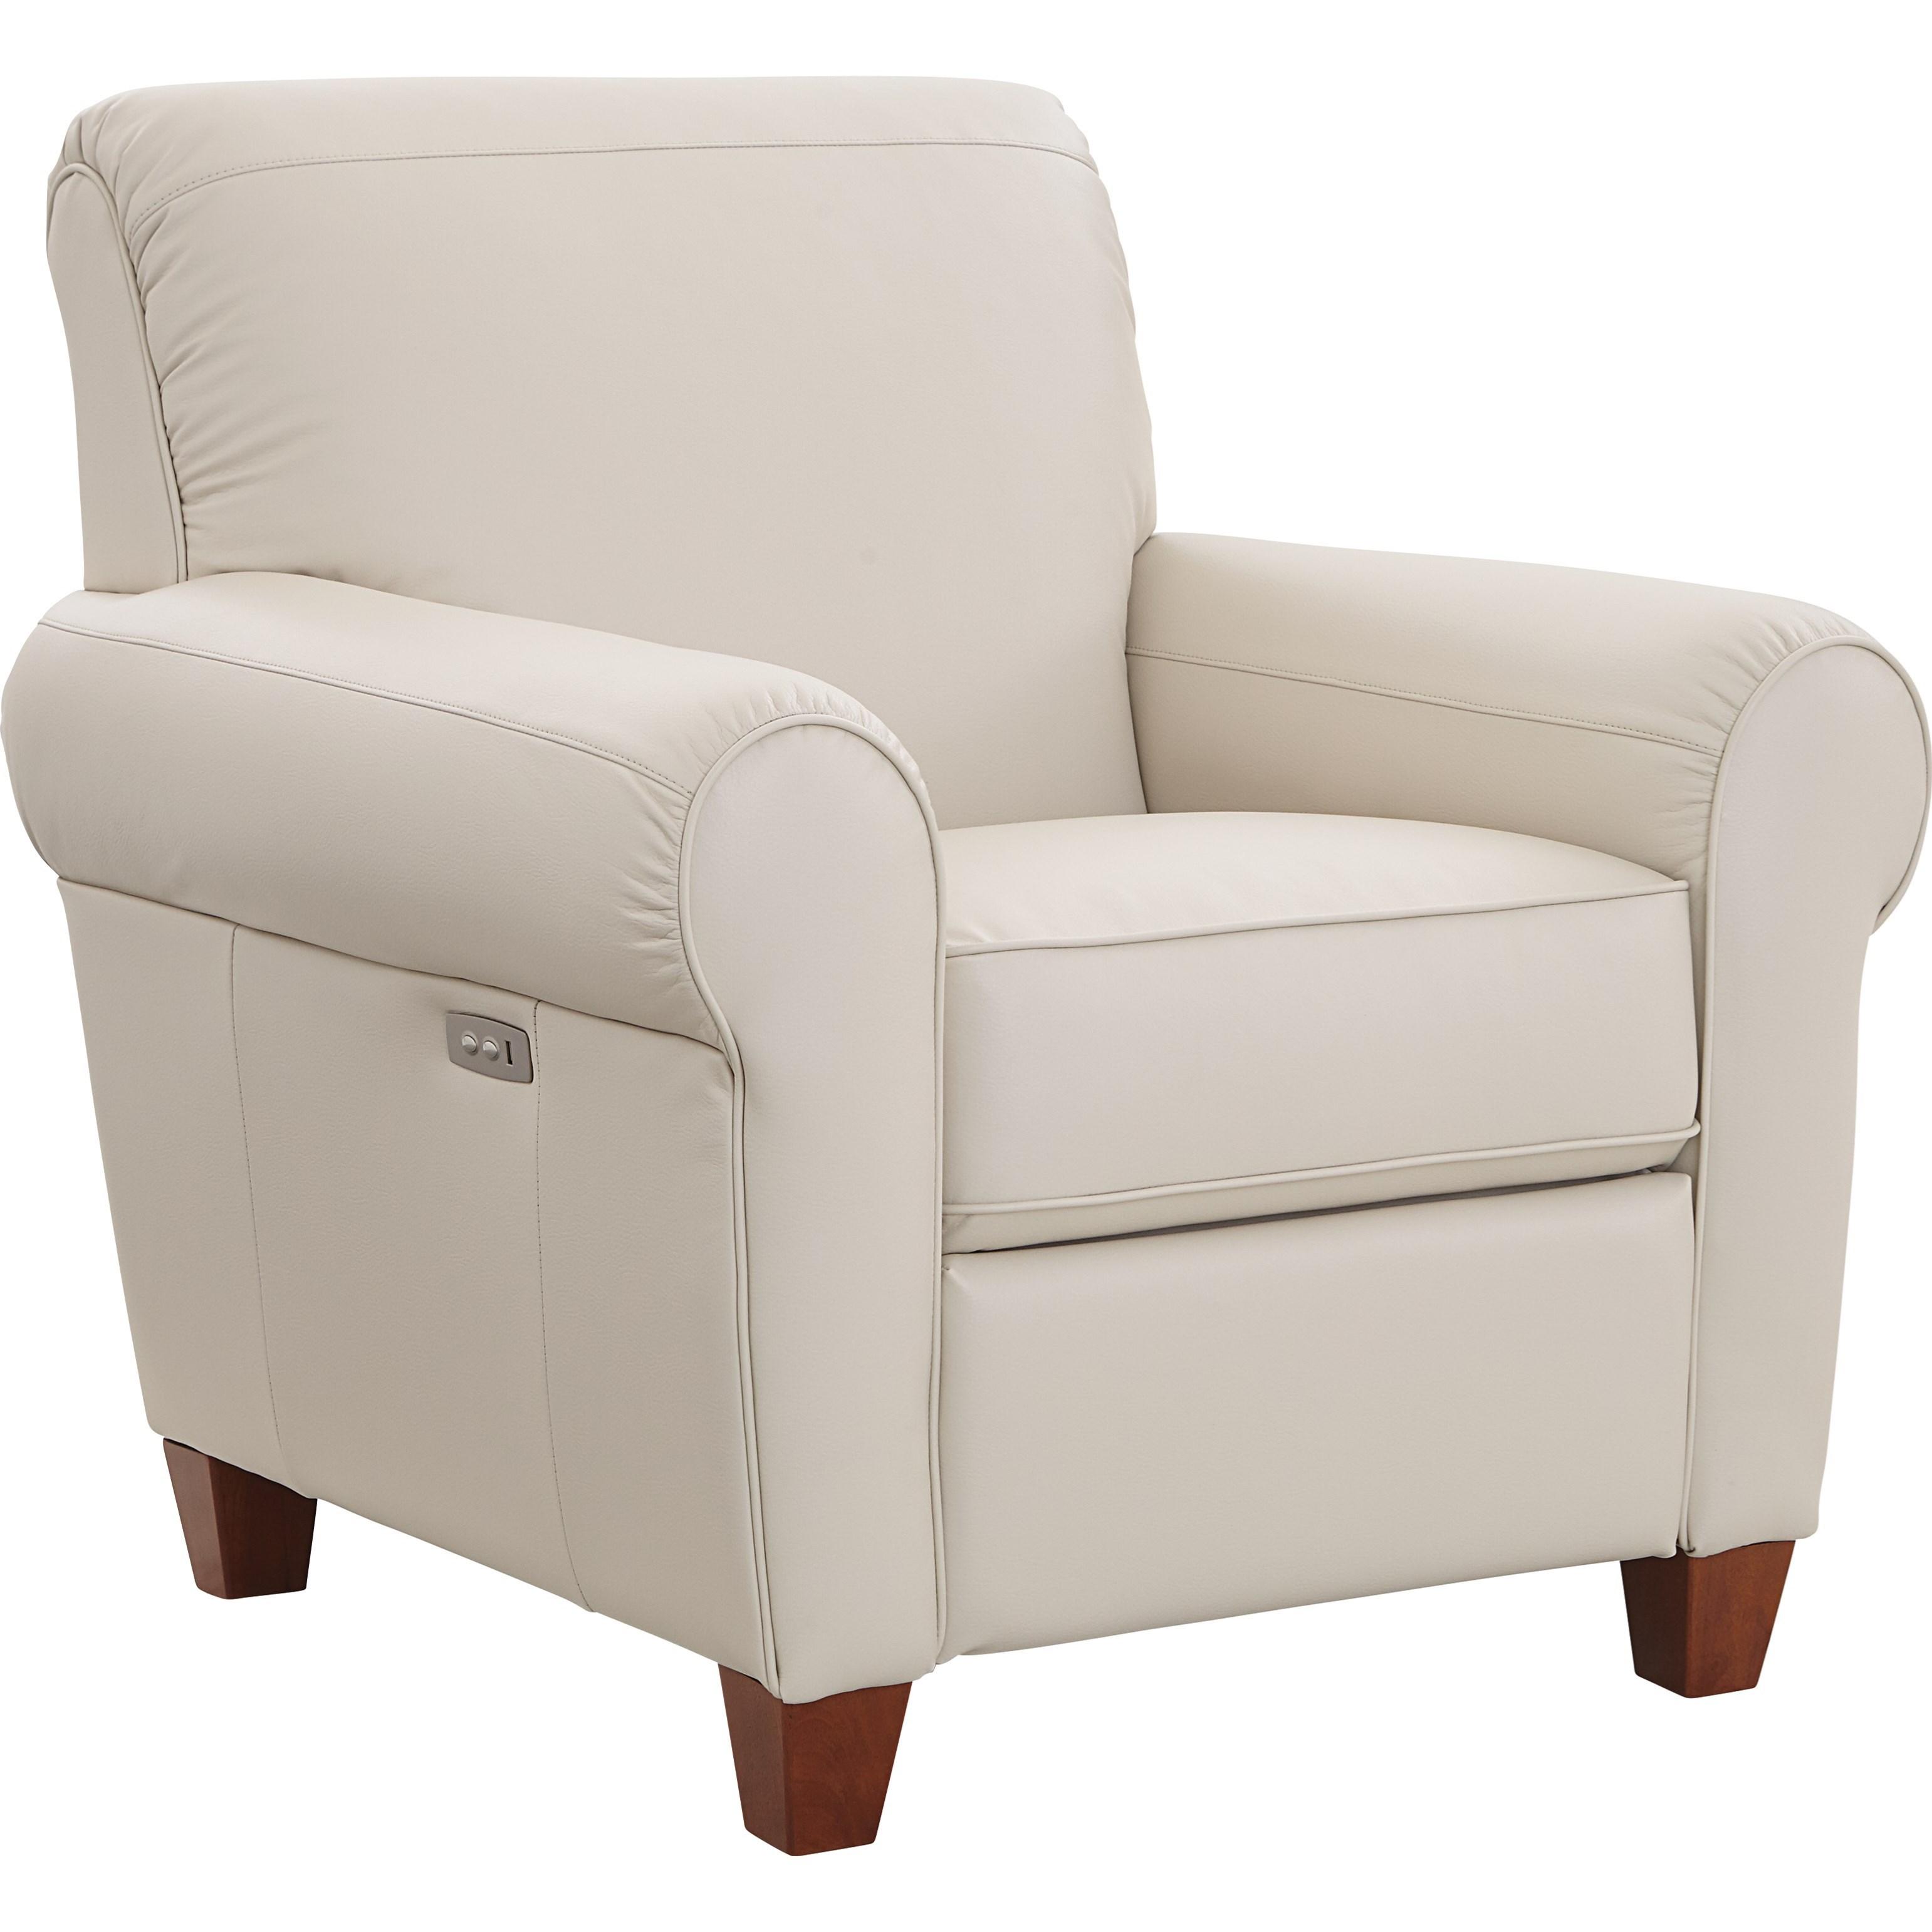 Bennett Duo™Reclining Chair by La-Z-Boy at Jordan's Home Furnishings